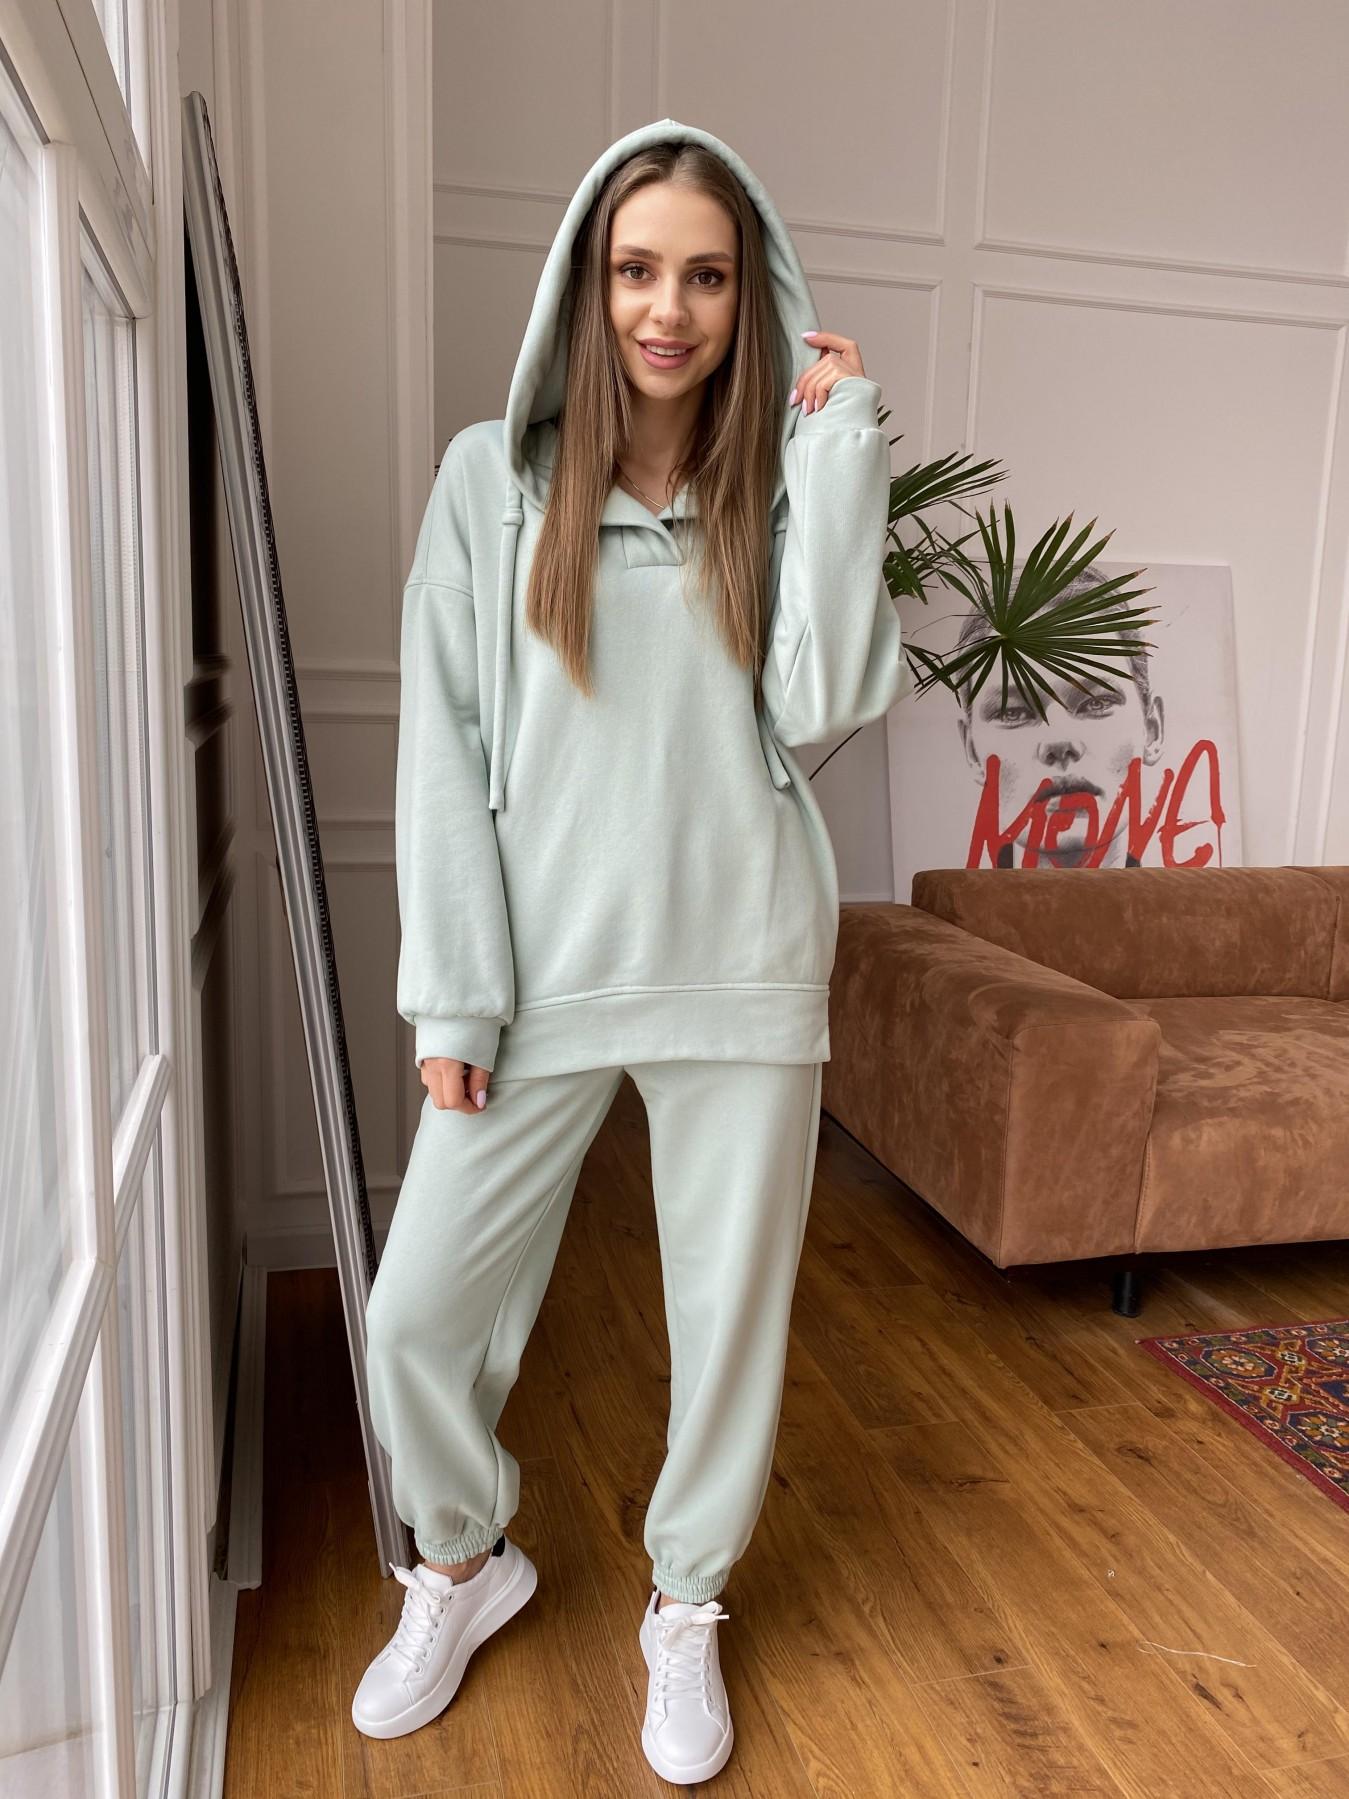 Ярис костюм из 3х нитки 10789 АРТ. 47616 Цвет: Олива Светлая - фото 1, интернет магазин tm-modus.ru